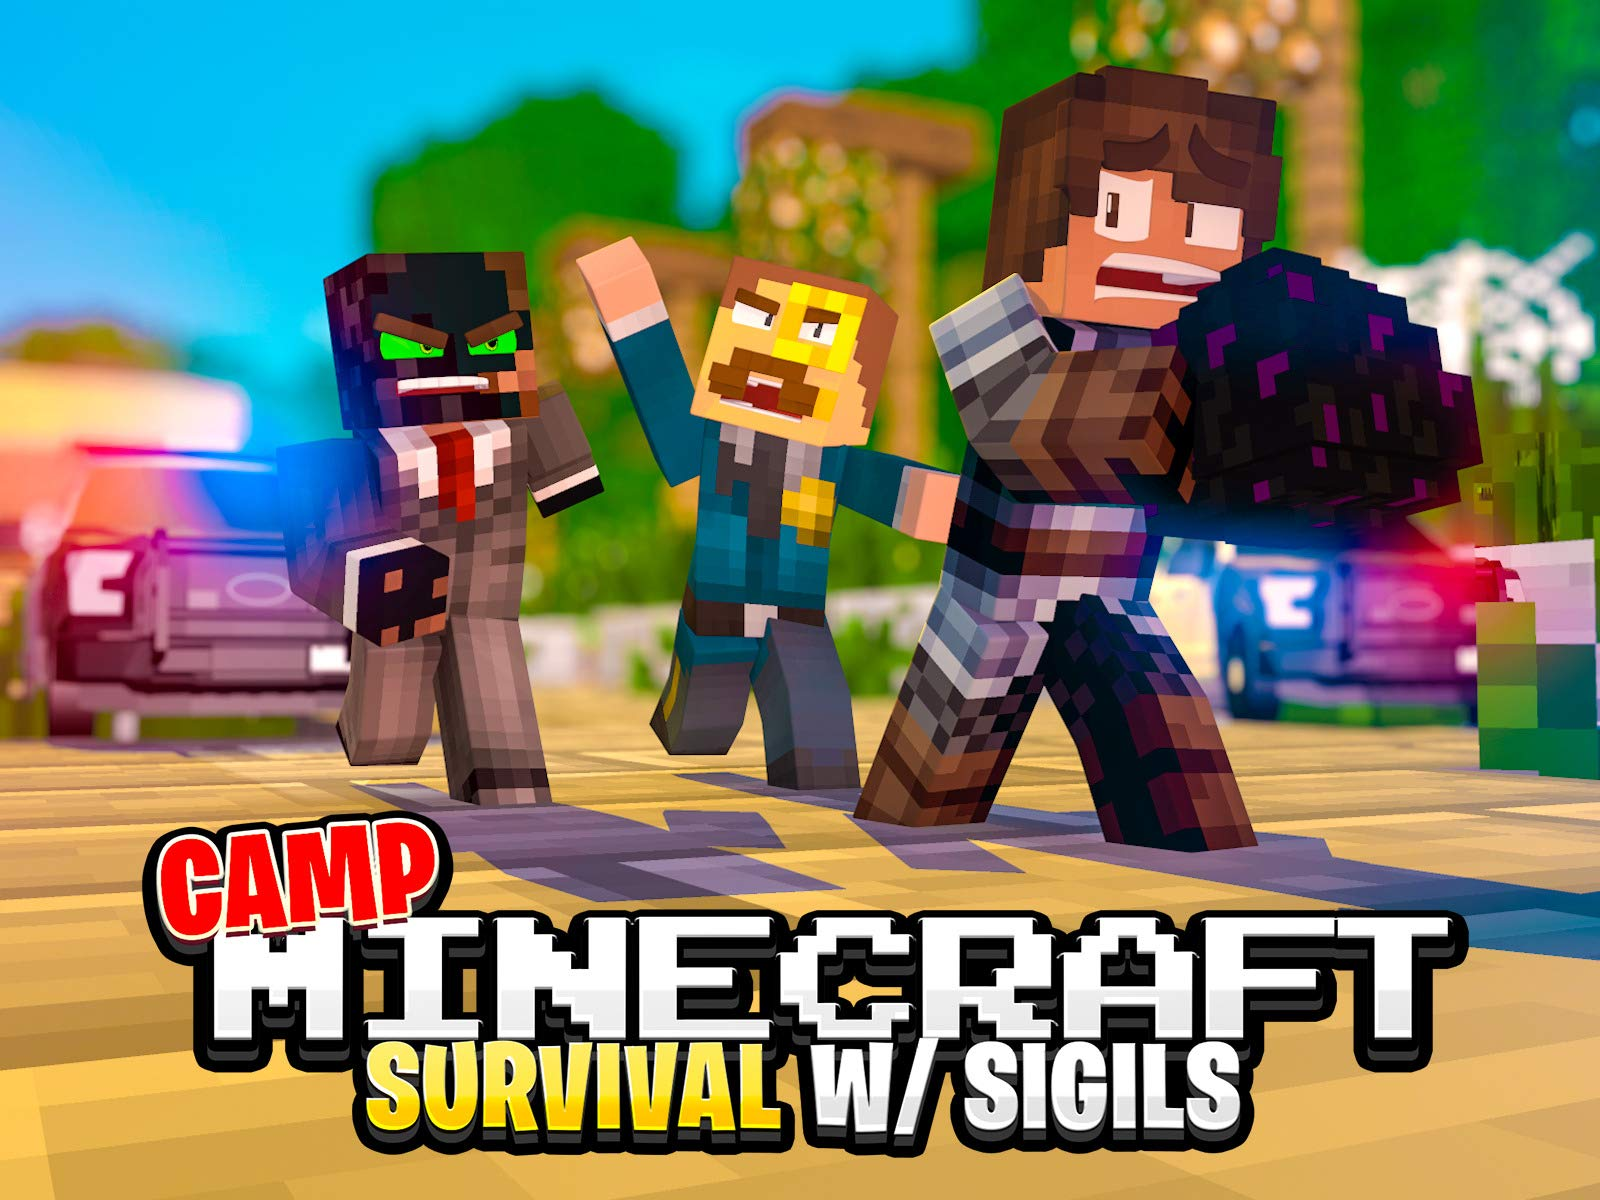 Watch Clip: Camp Minecraft Survival (Sigils)  Prime Video